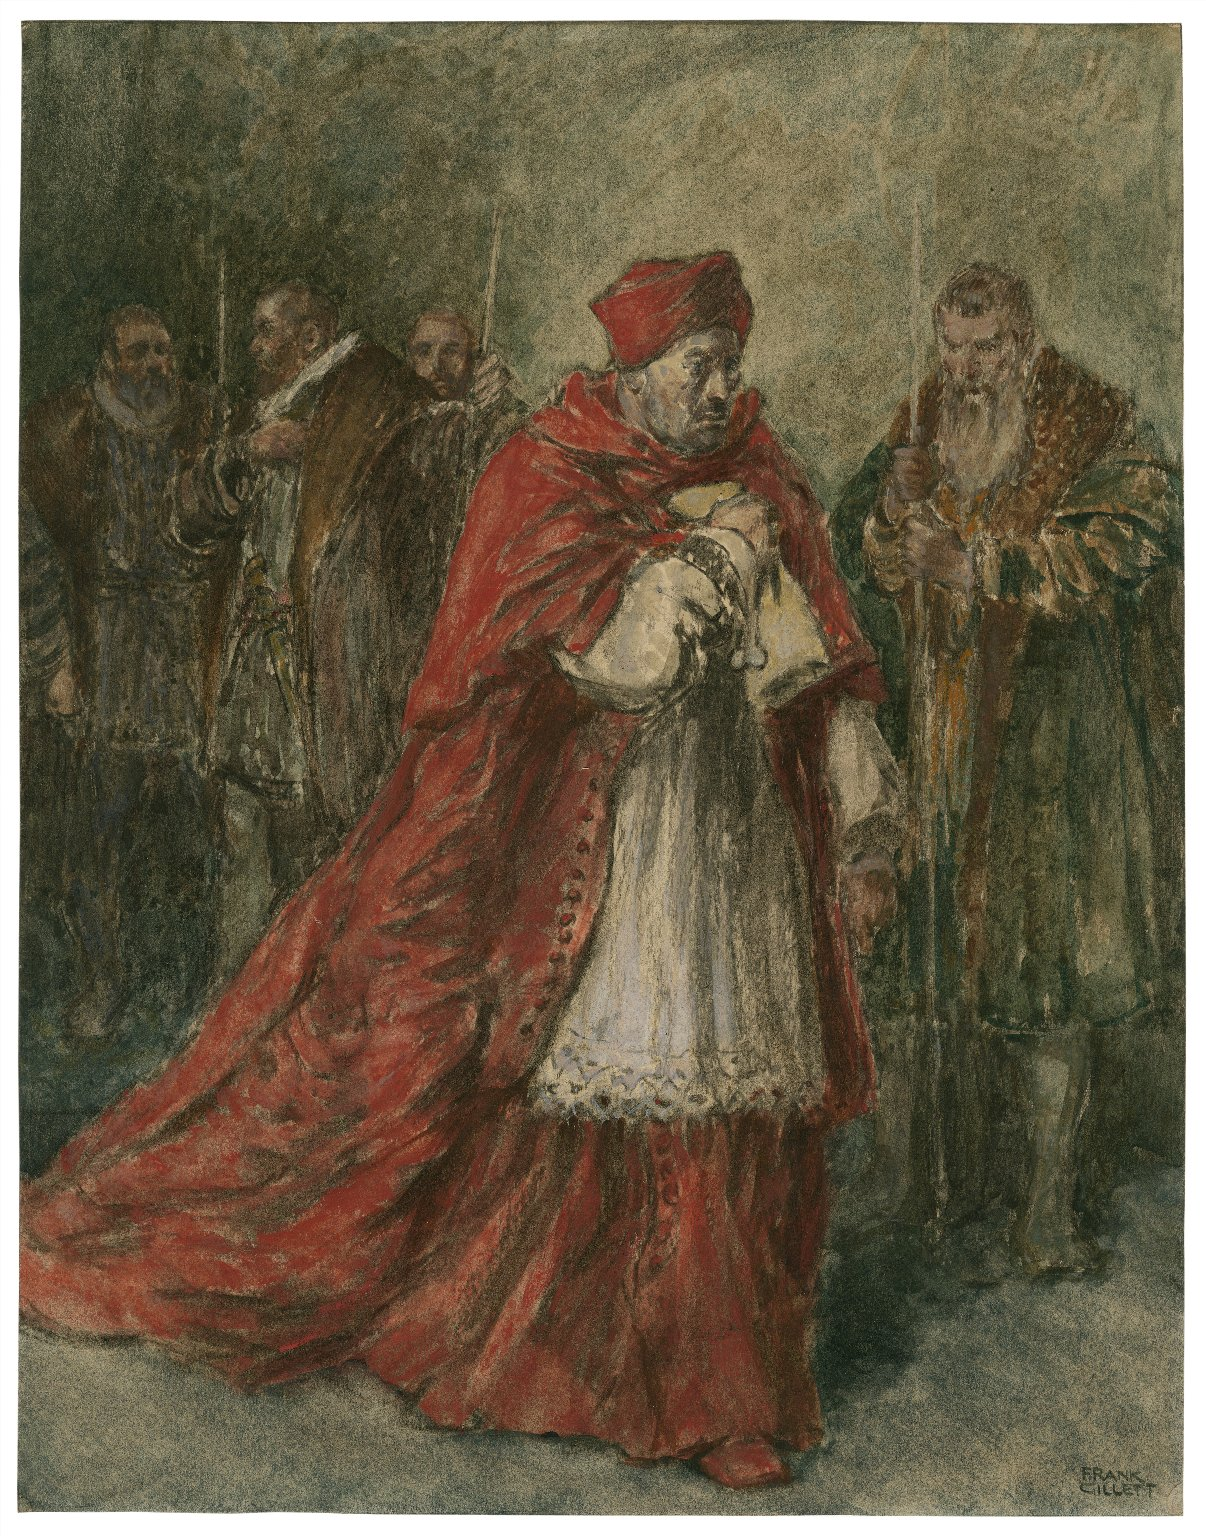 King Henry VIII, III, 2 : the dismissal of Cardinal Wolsey [graphic] / Frank Gillett.